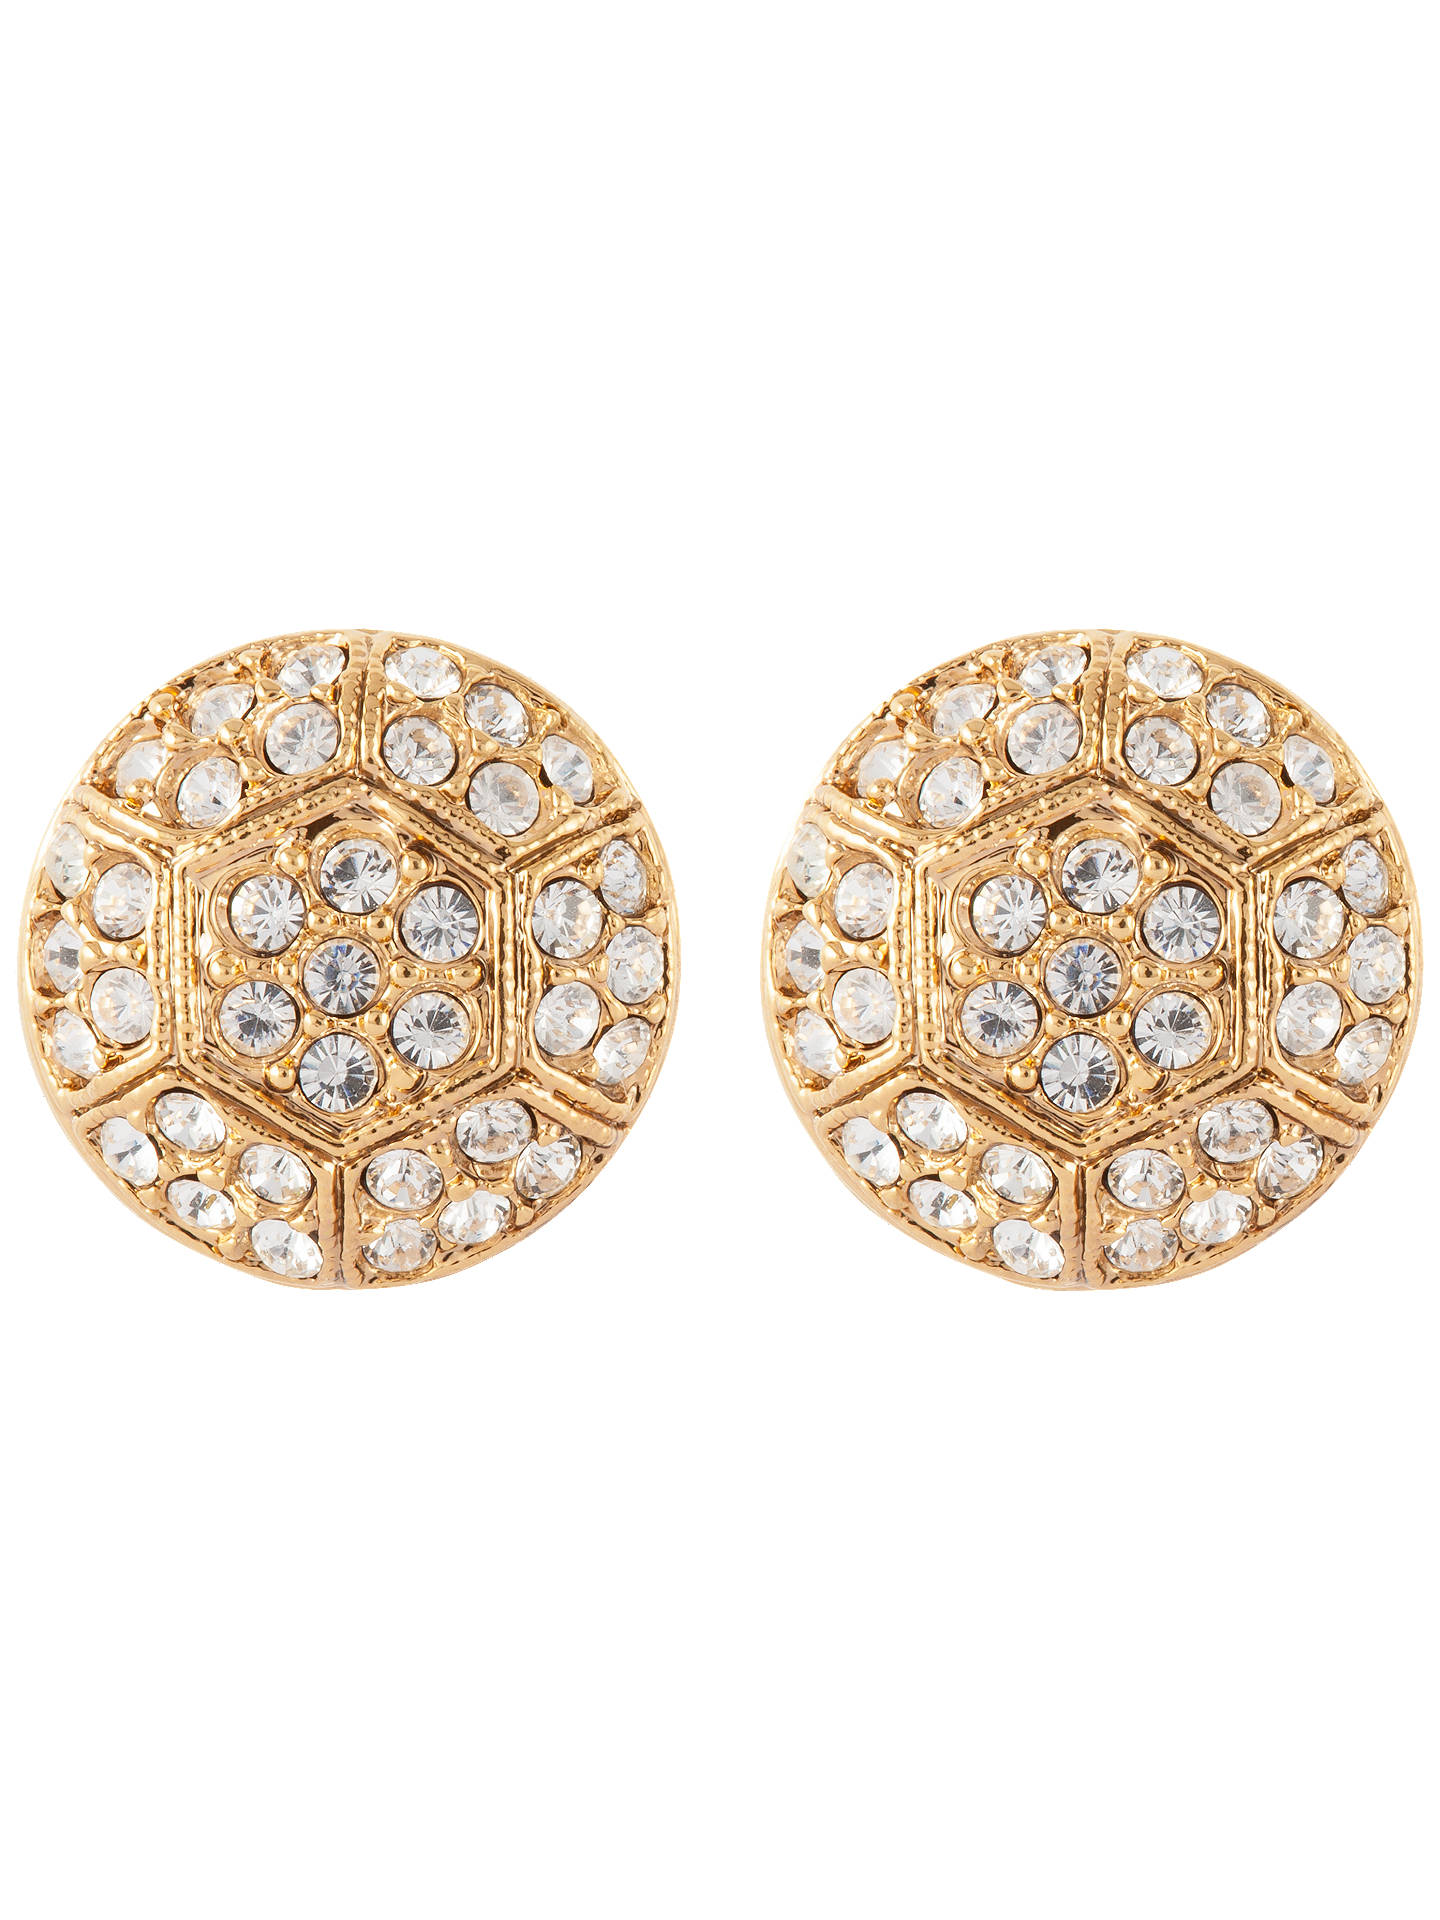 Susan Caplan Vintage 22ct Gold Plated Deco Style Swarovski Crystal Stud Earrings Online At